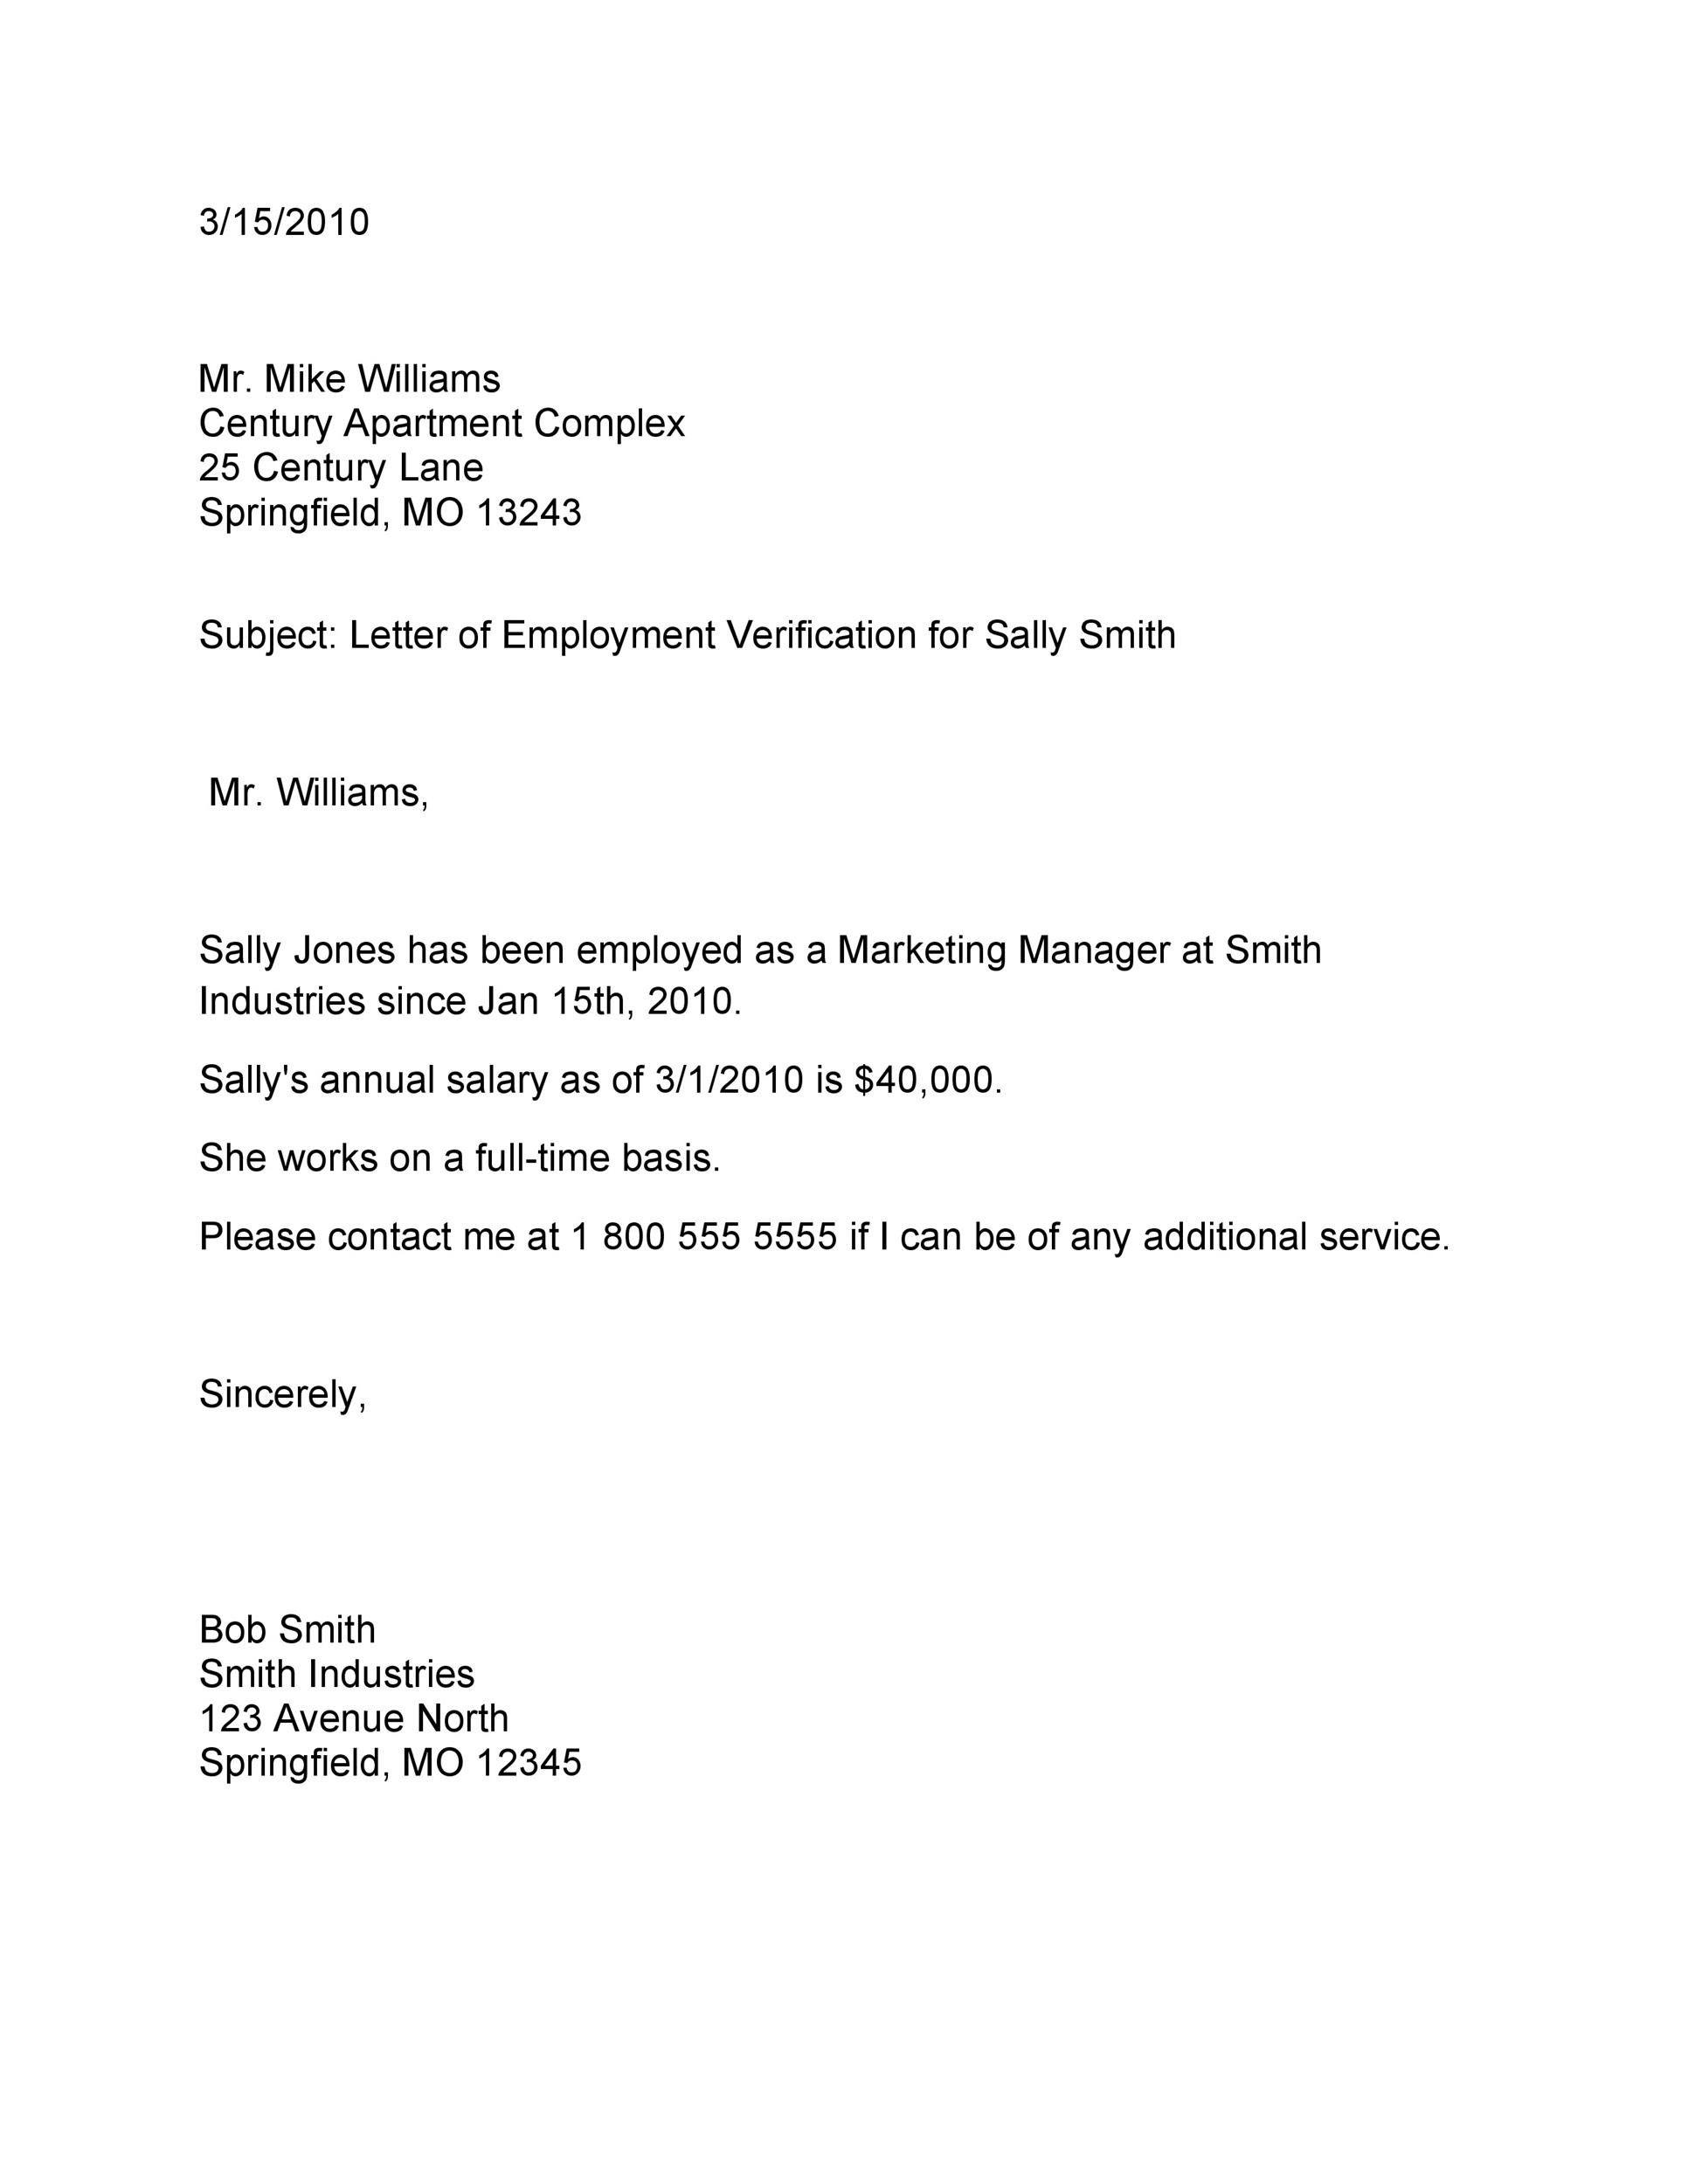 Form Templates Free Word Templates Employment Form Lettering Employment Verification Letter